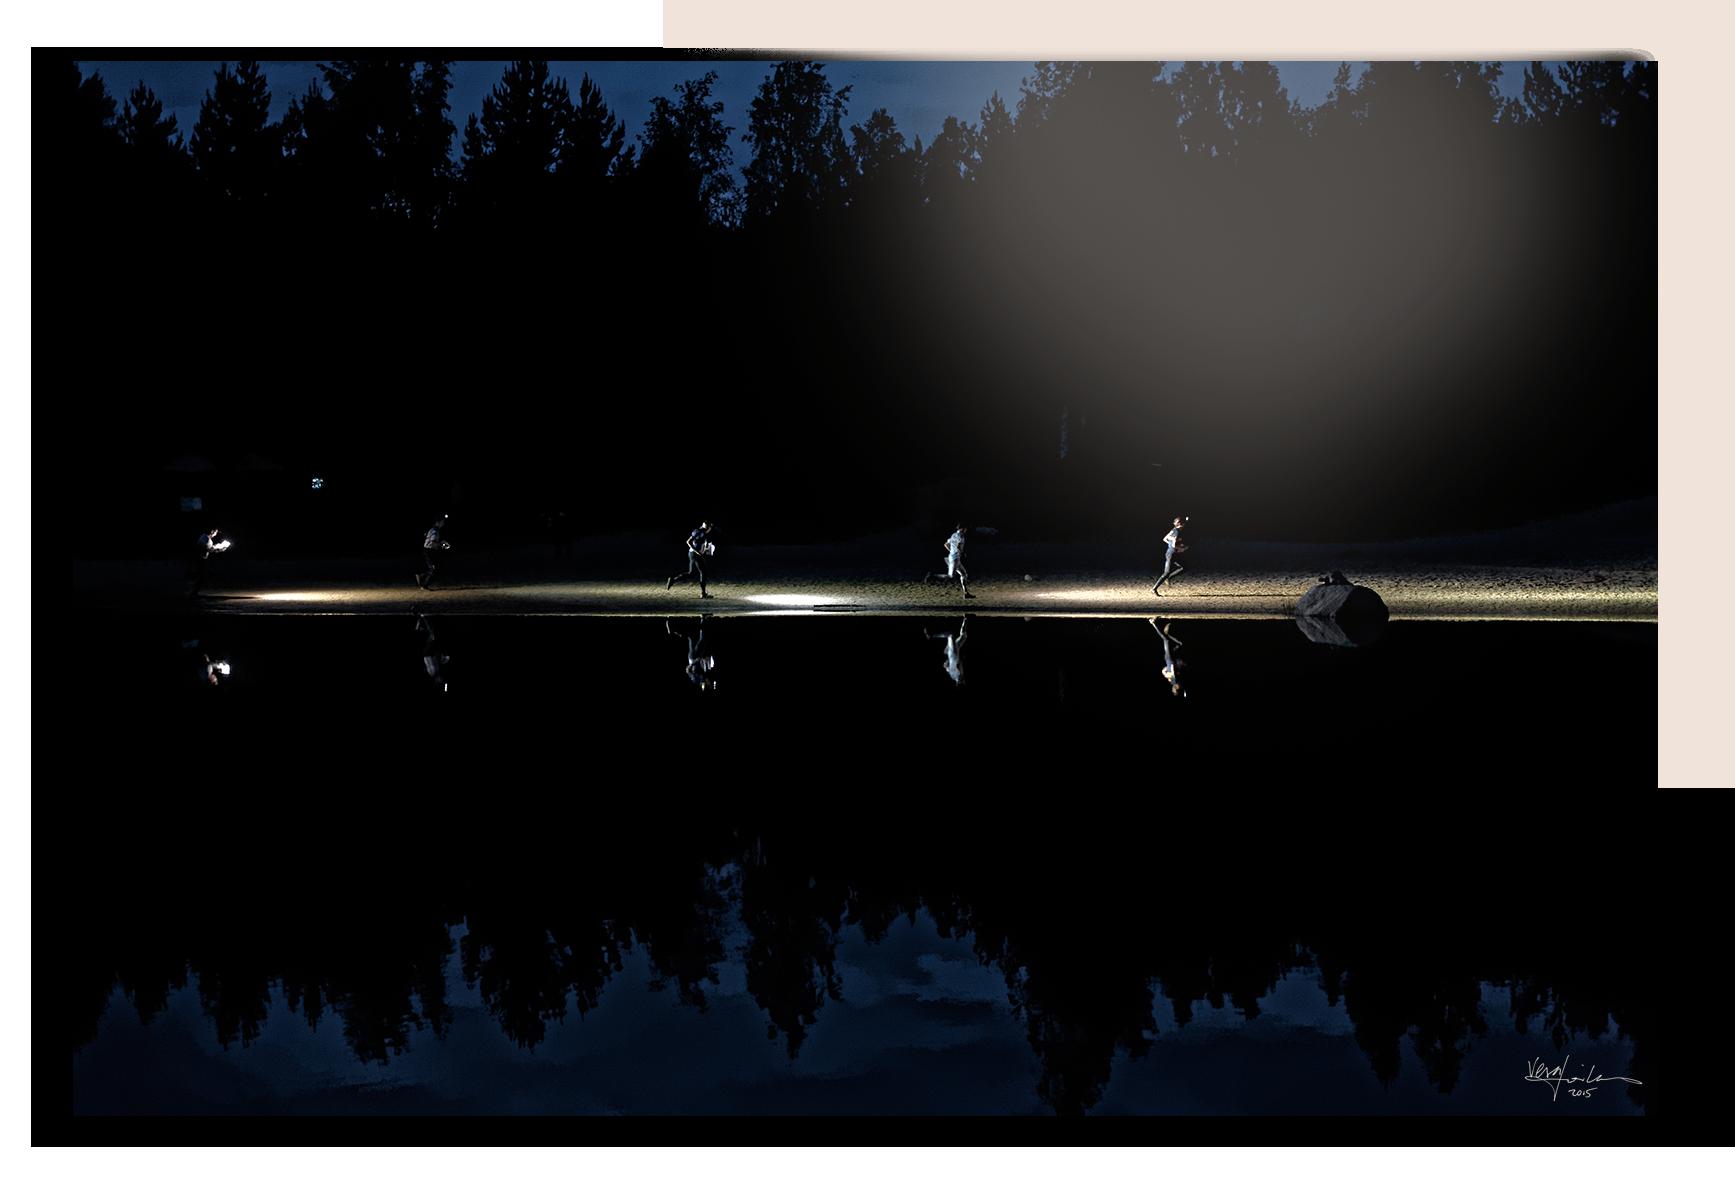 ALUMINUM EDITION - PEARL NECKLACE | NIGHT-O J-STYLE- 01:33 am June 14th, 2015 · Hiekkahelmi, Paimio, Finland